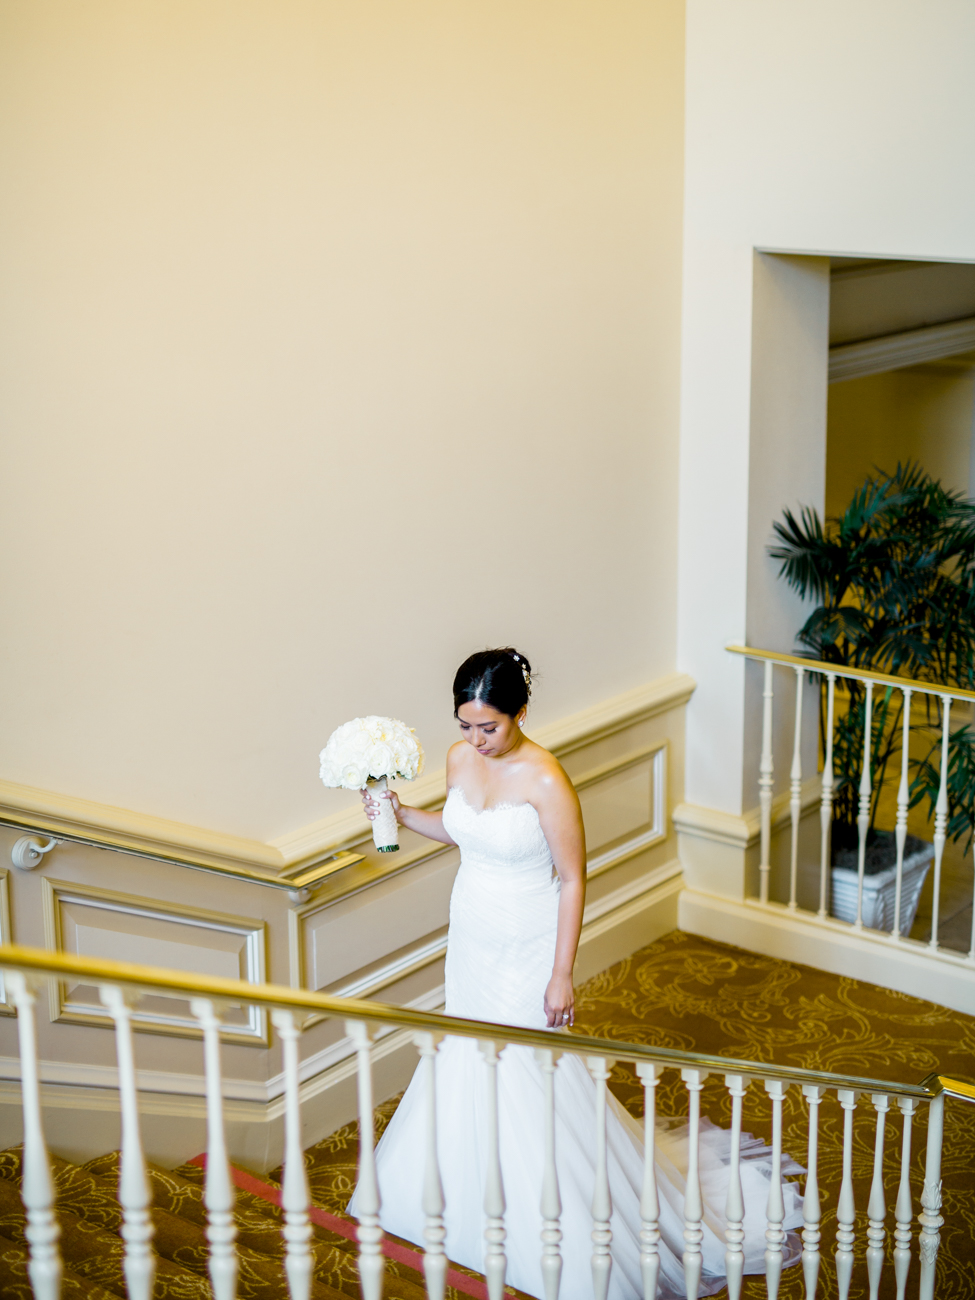 DennisRoyCoronel_pasadena_langham_wedding-23.jpg